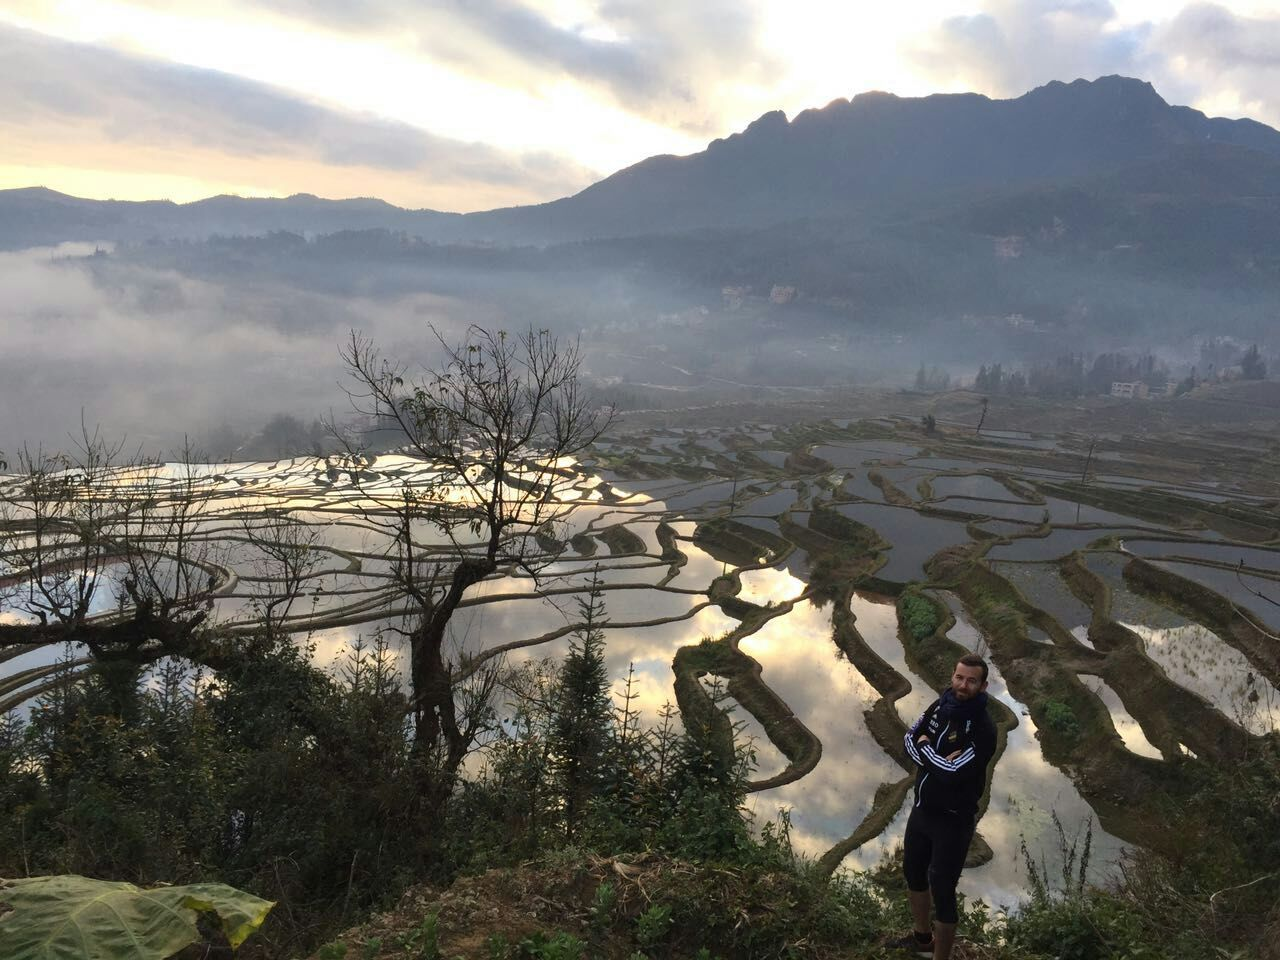 mmexport1485740571304 - Cycling trip through Yunnan: China's countryside